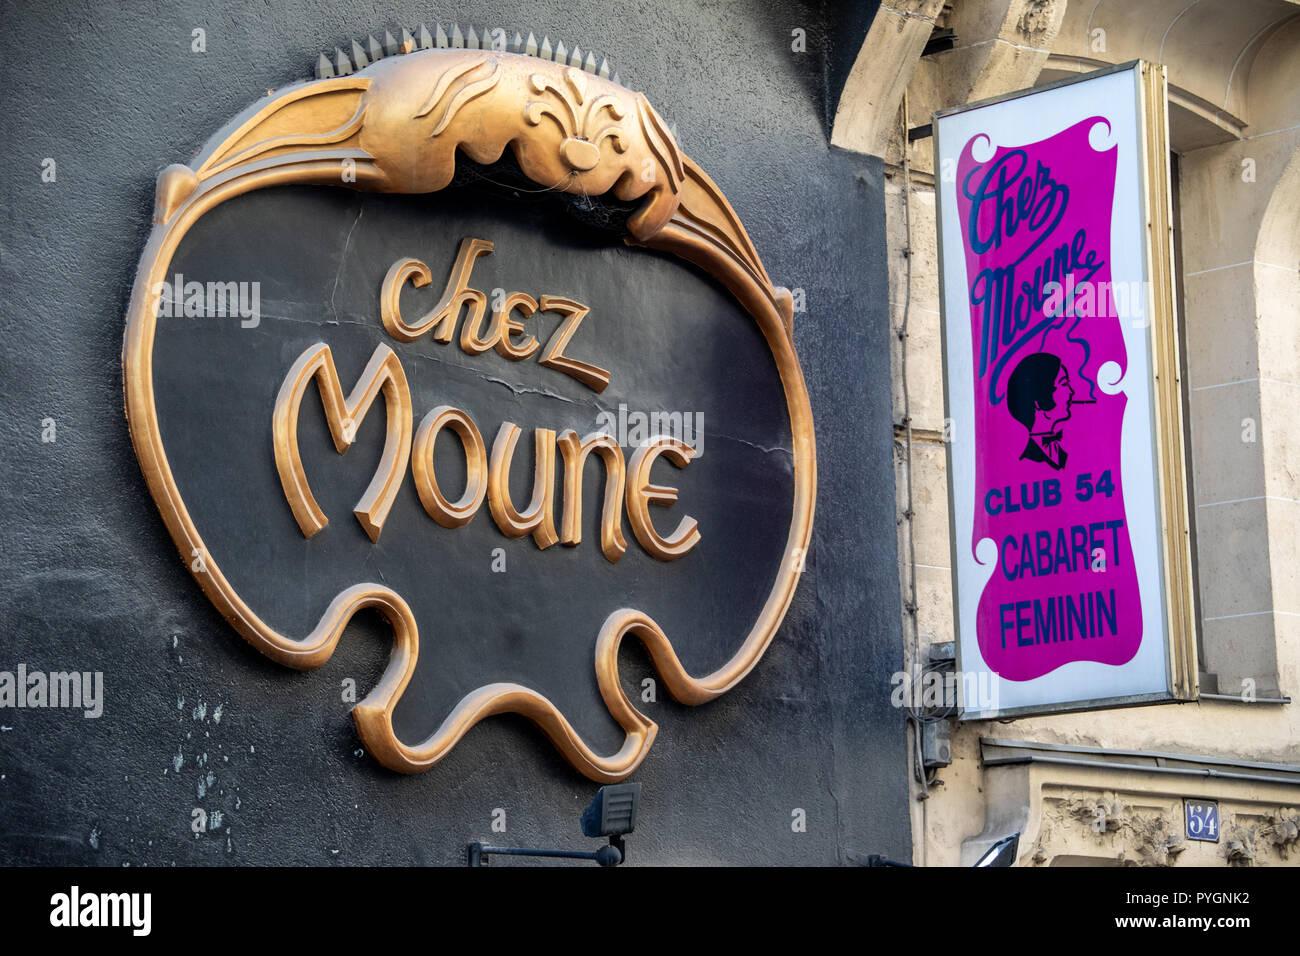 Chez Moune, Club 54 Cabaret Feminin, Paris, France - Stock Image